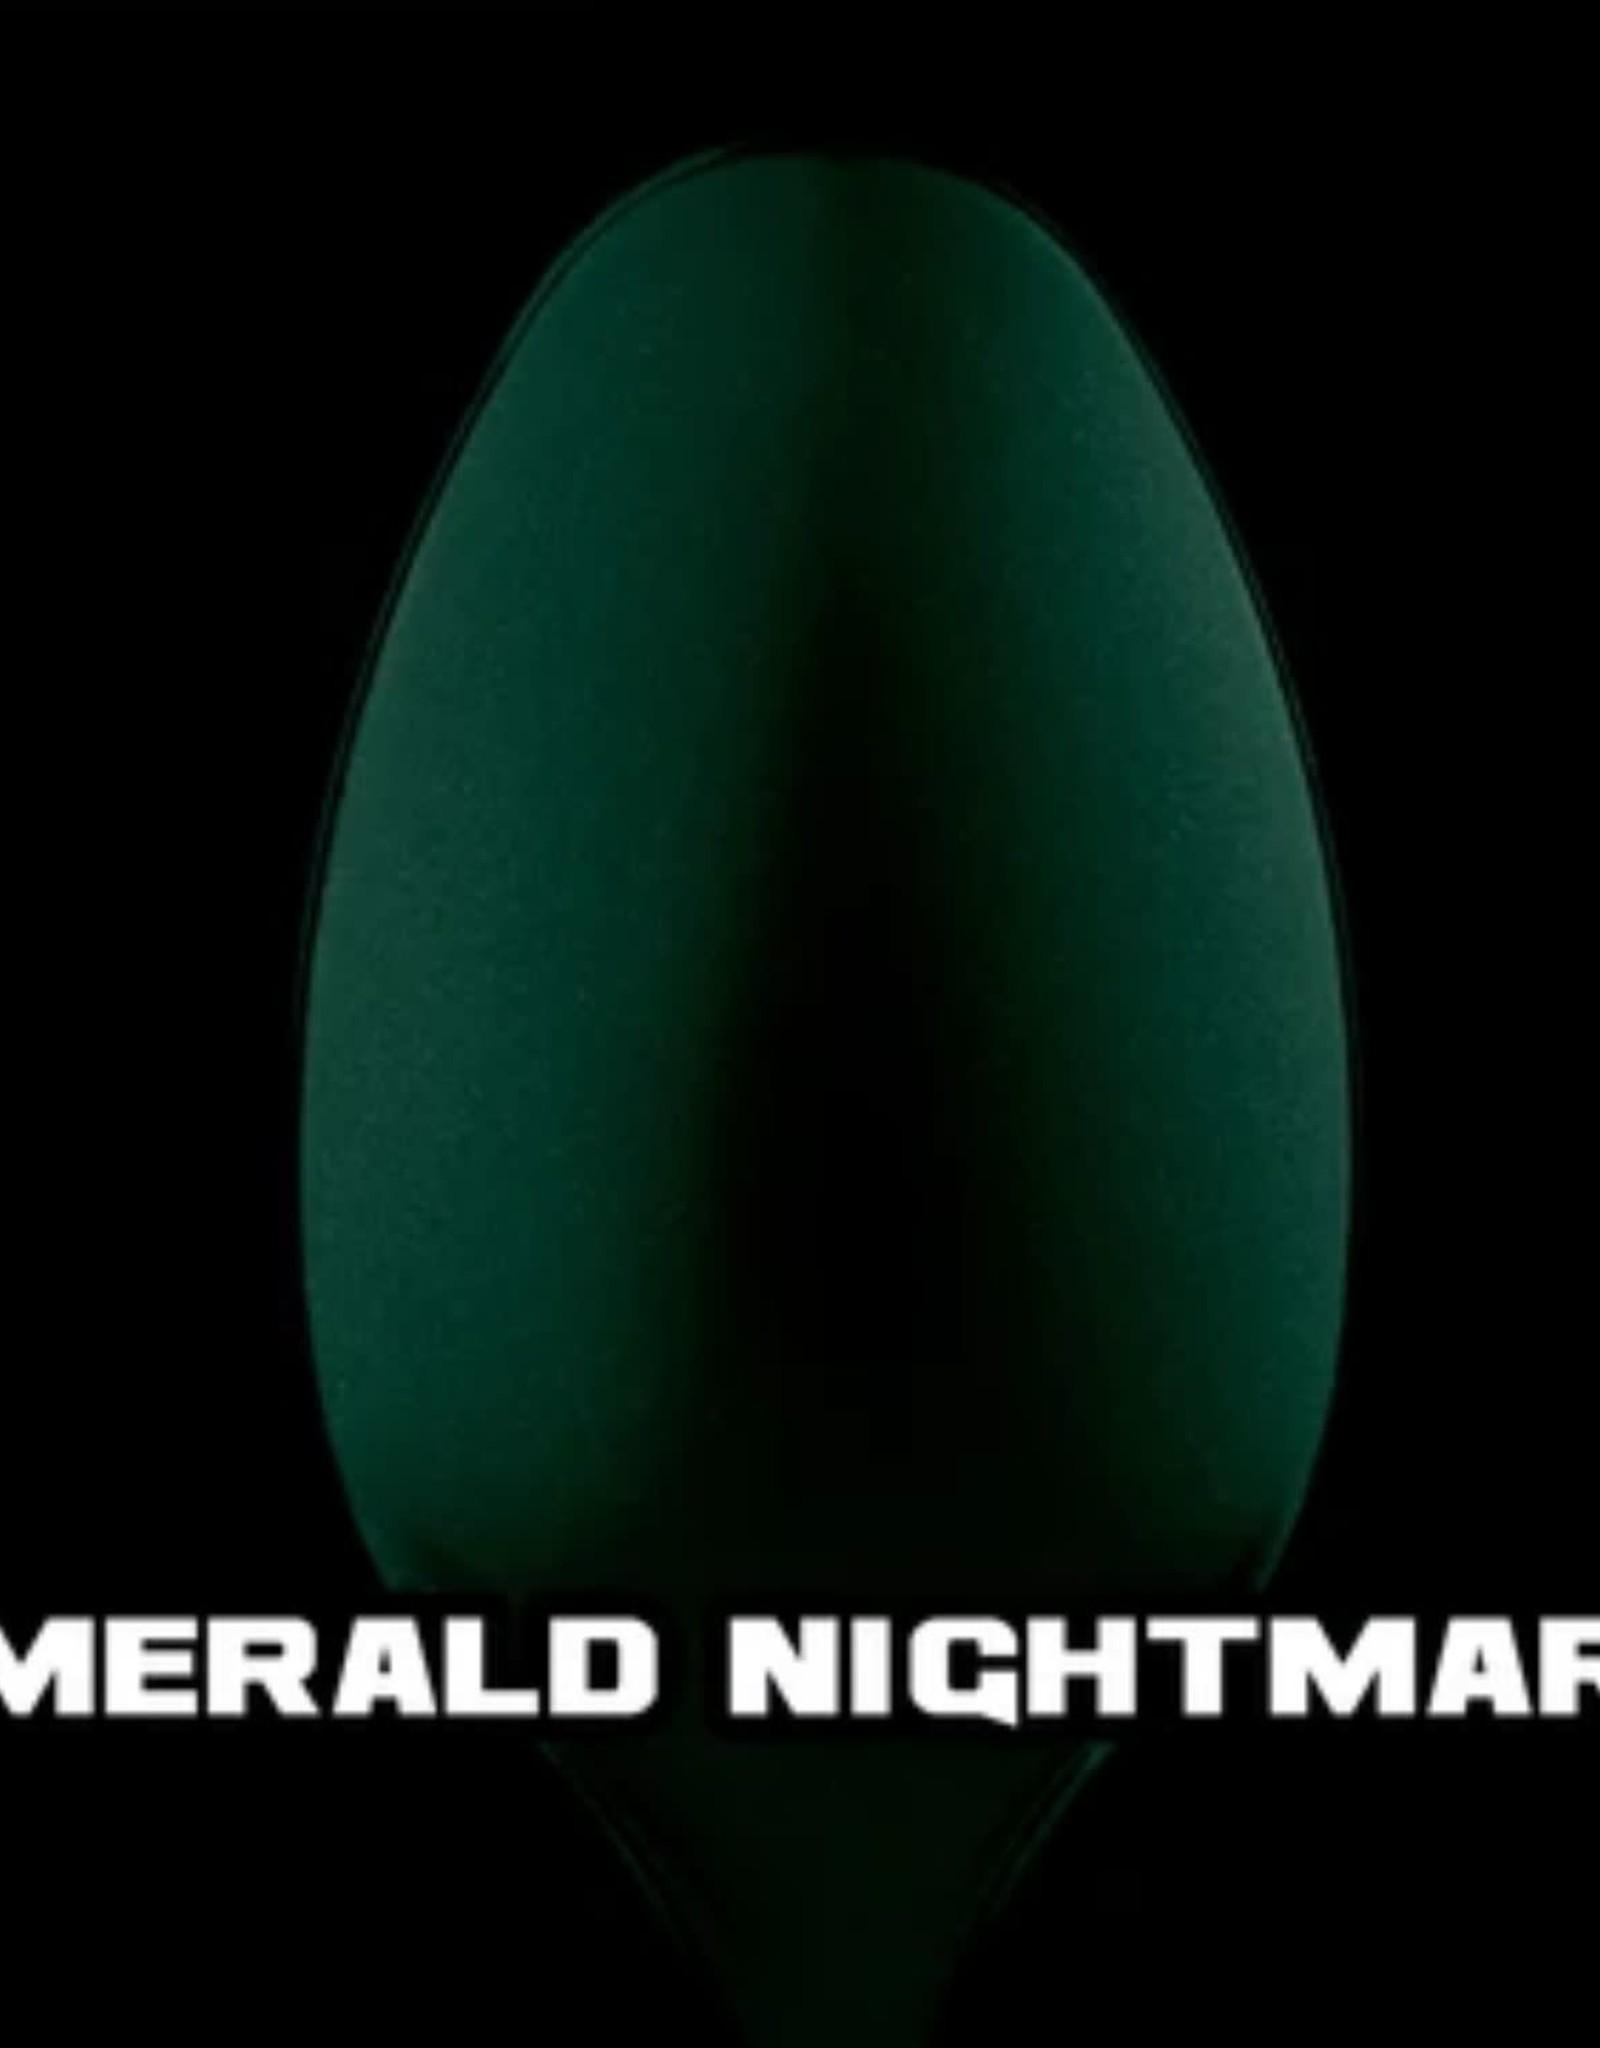 Turbo Dork Emerald Nightmare - Metallic